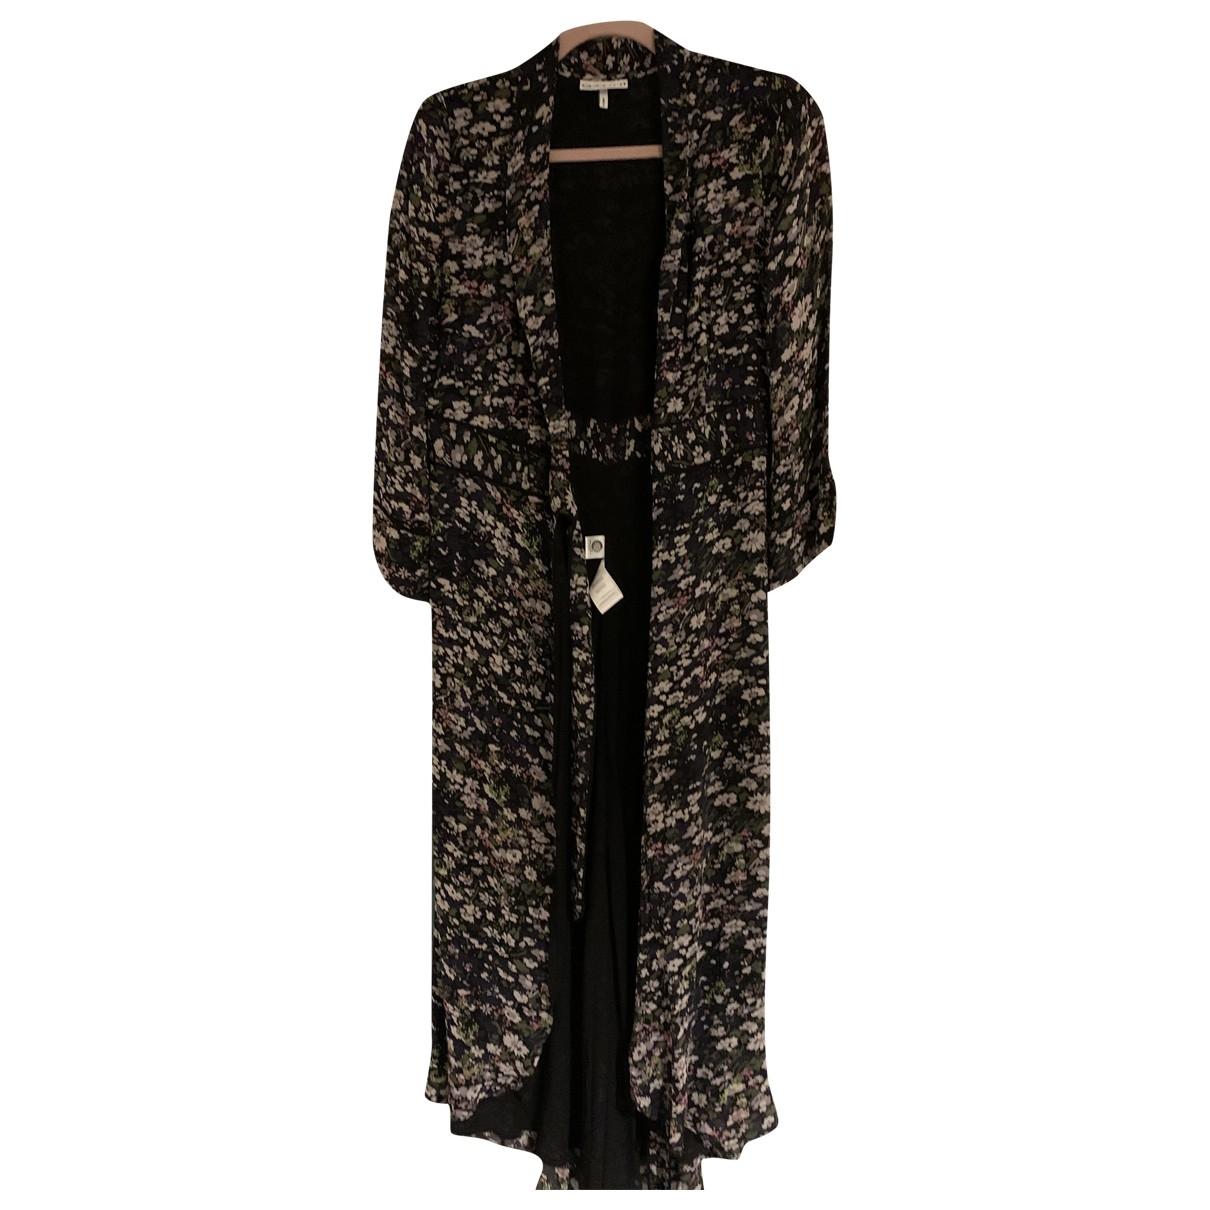 Ganni Fall Winter 2019 Kleid in Viskose